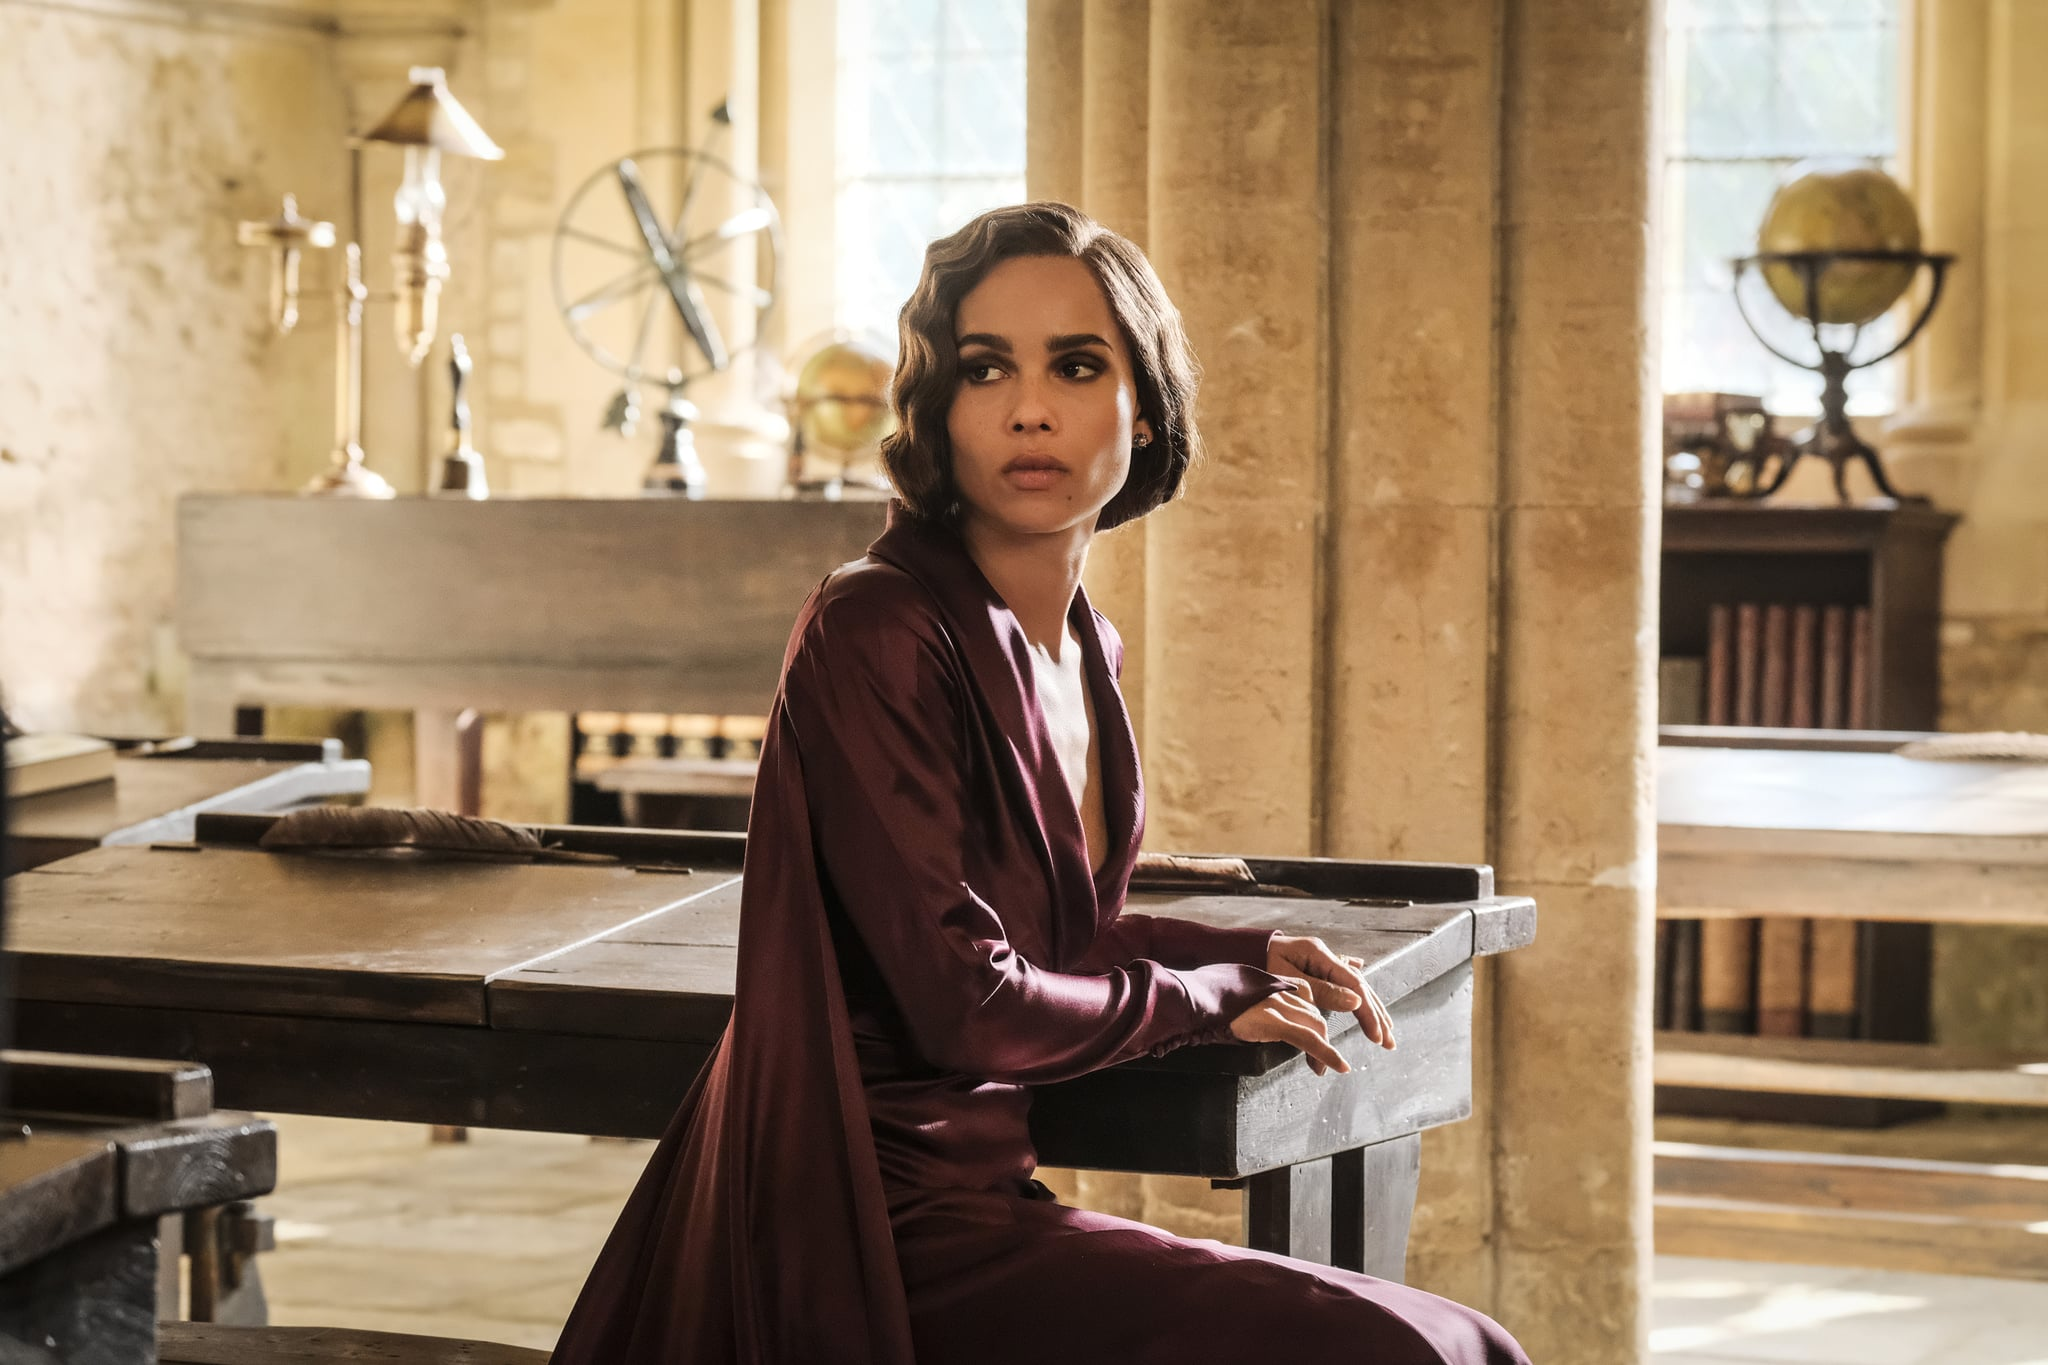 American actress Zoe Kravitz as Leta Lestrange is Fantastic Beasts: Crimes of Grindelwald